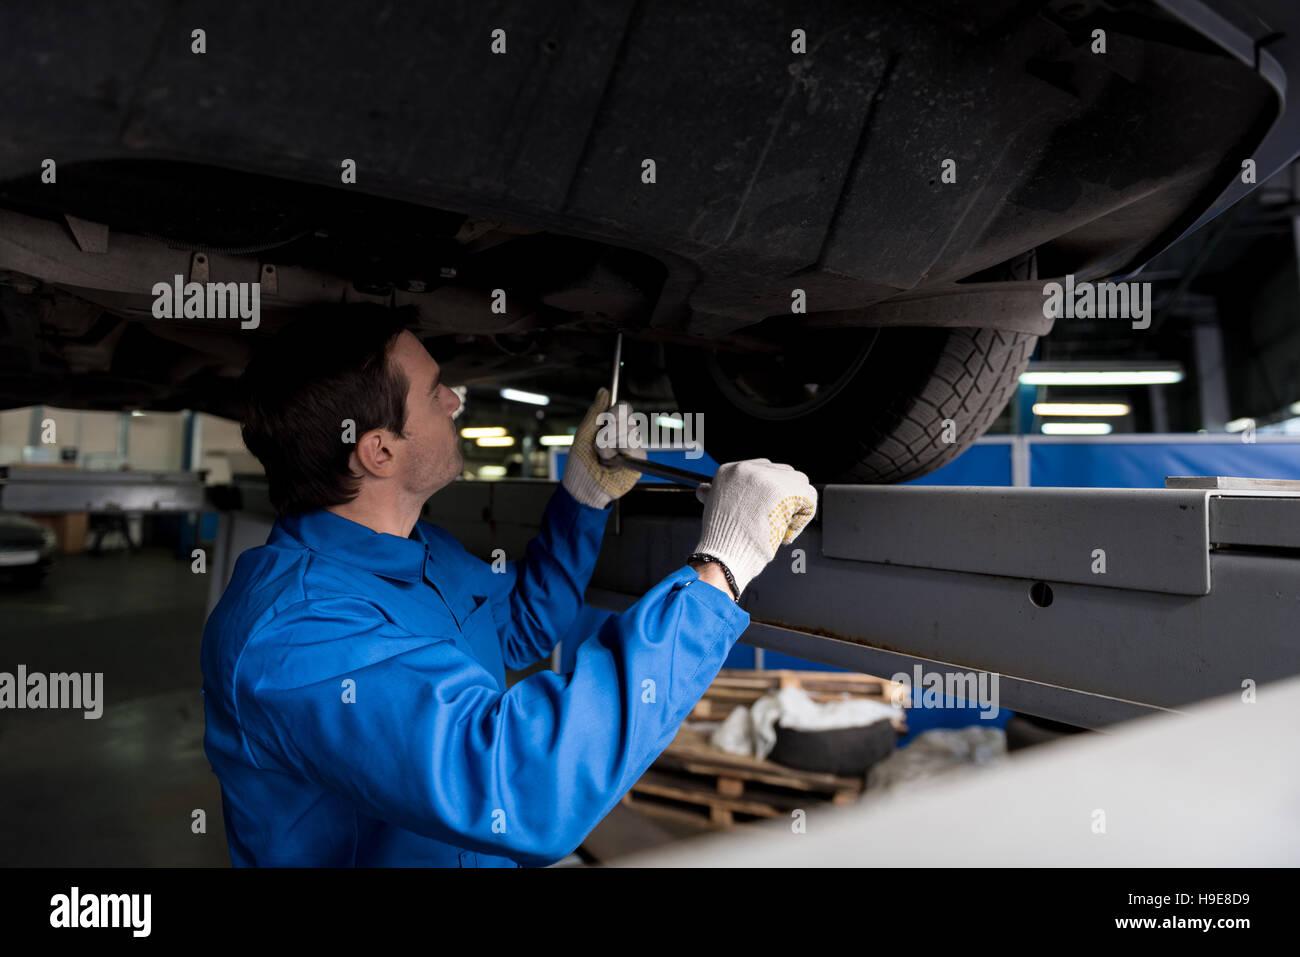 Professional mechanic reparing a car. - Stock Image